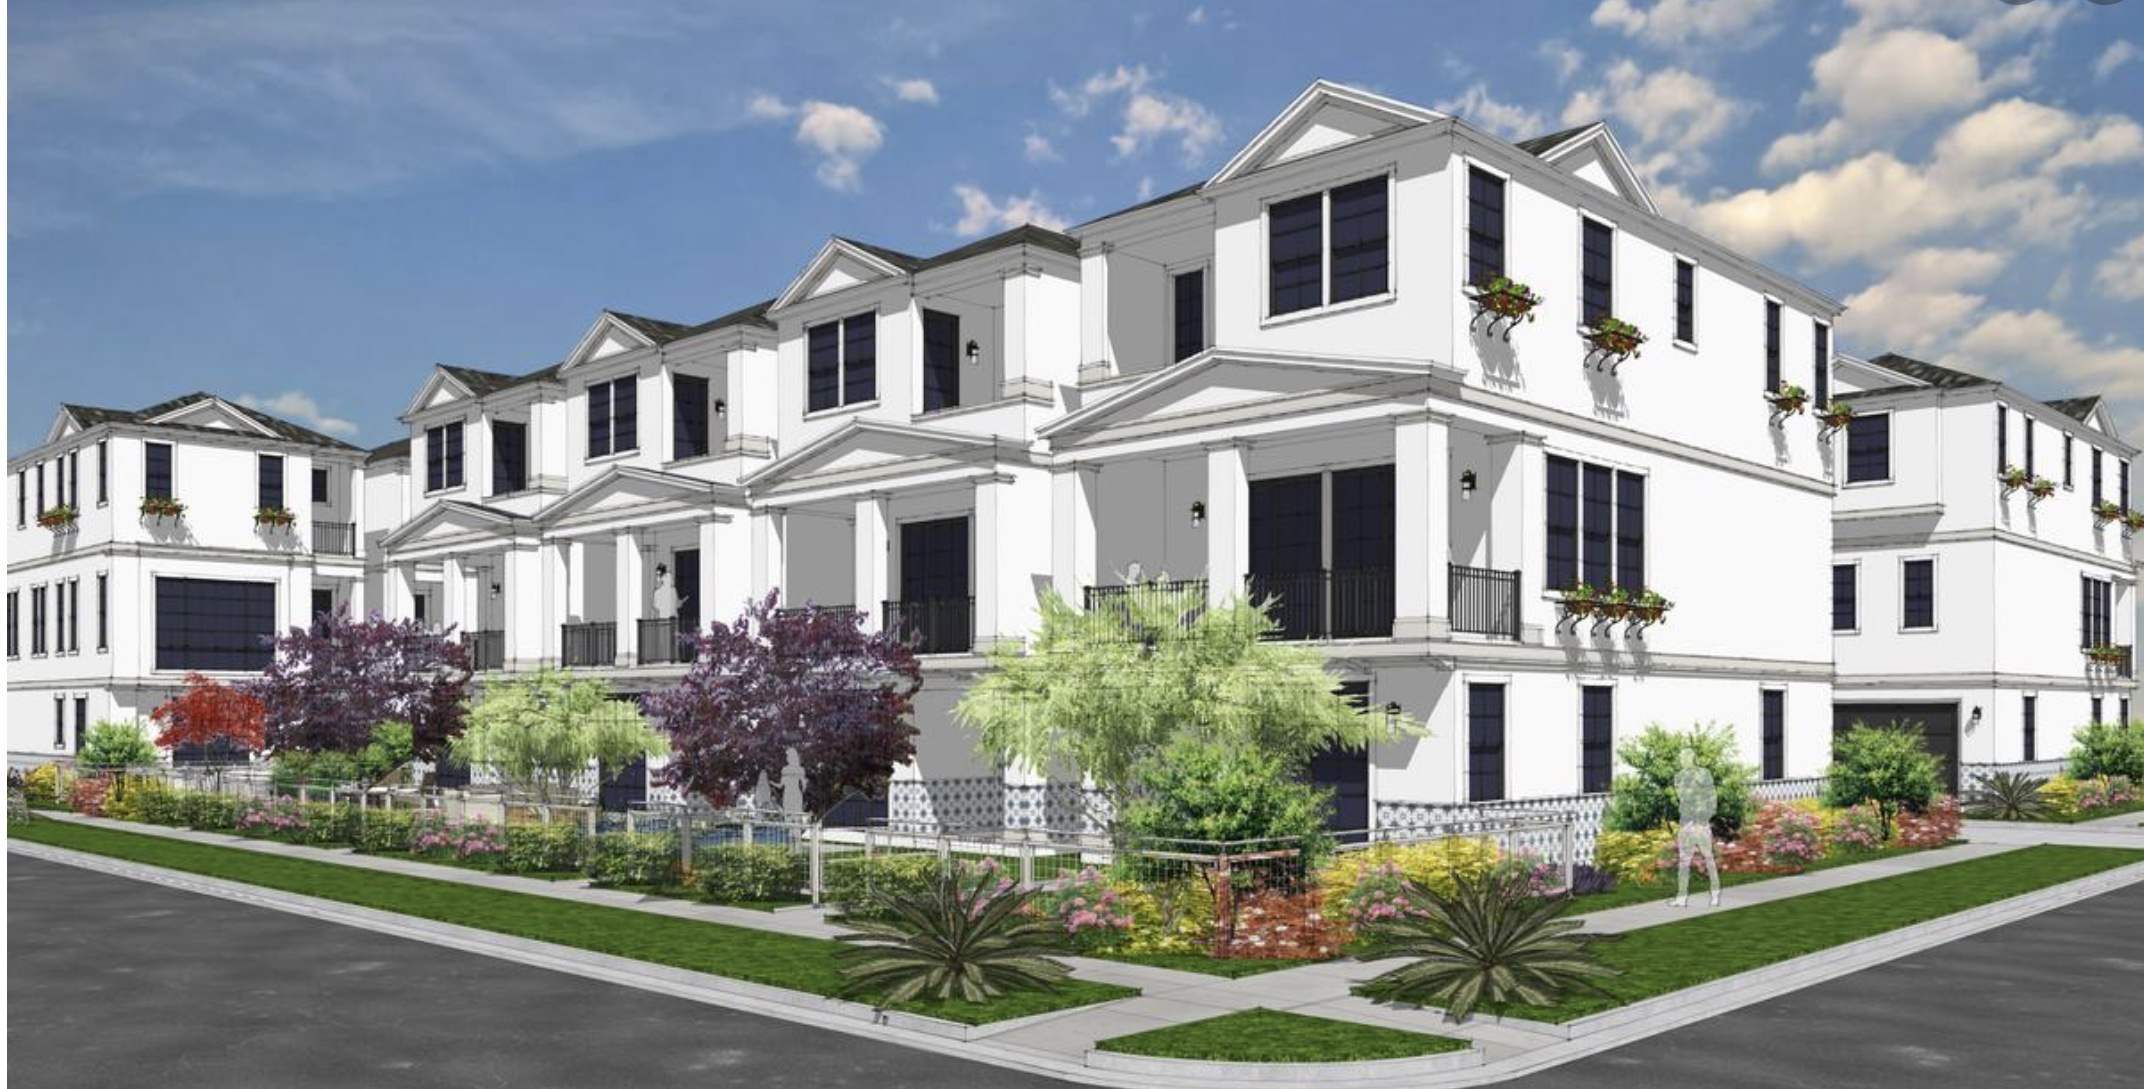 1234 U Street via BSB Design